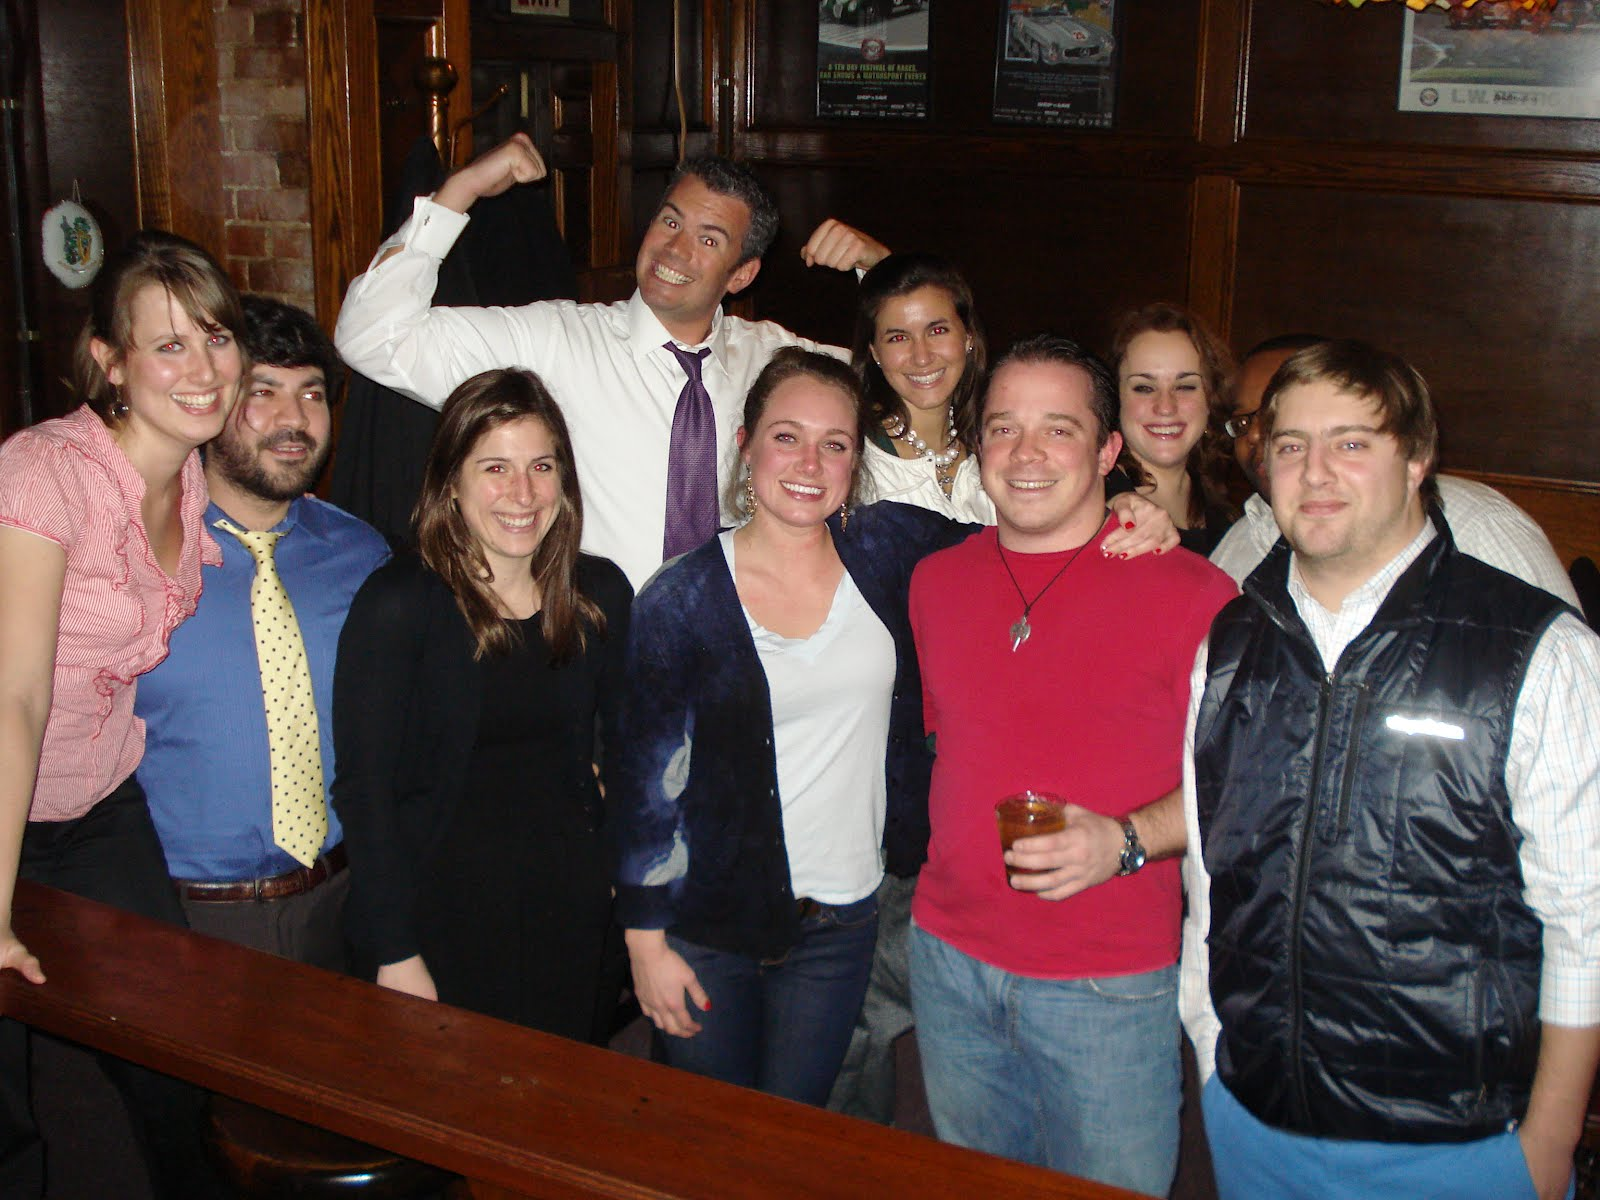 Pittsburgh Happy Hour: Grant Street Tavern